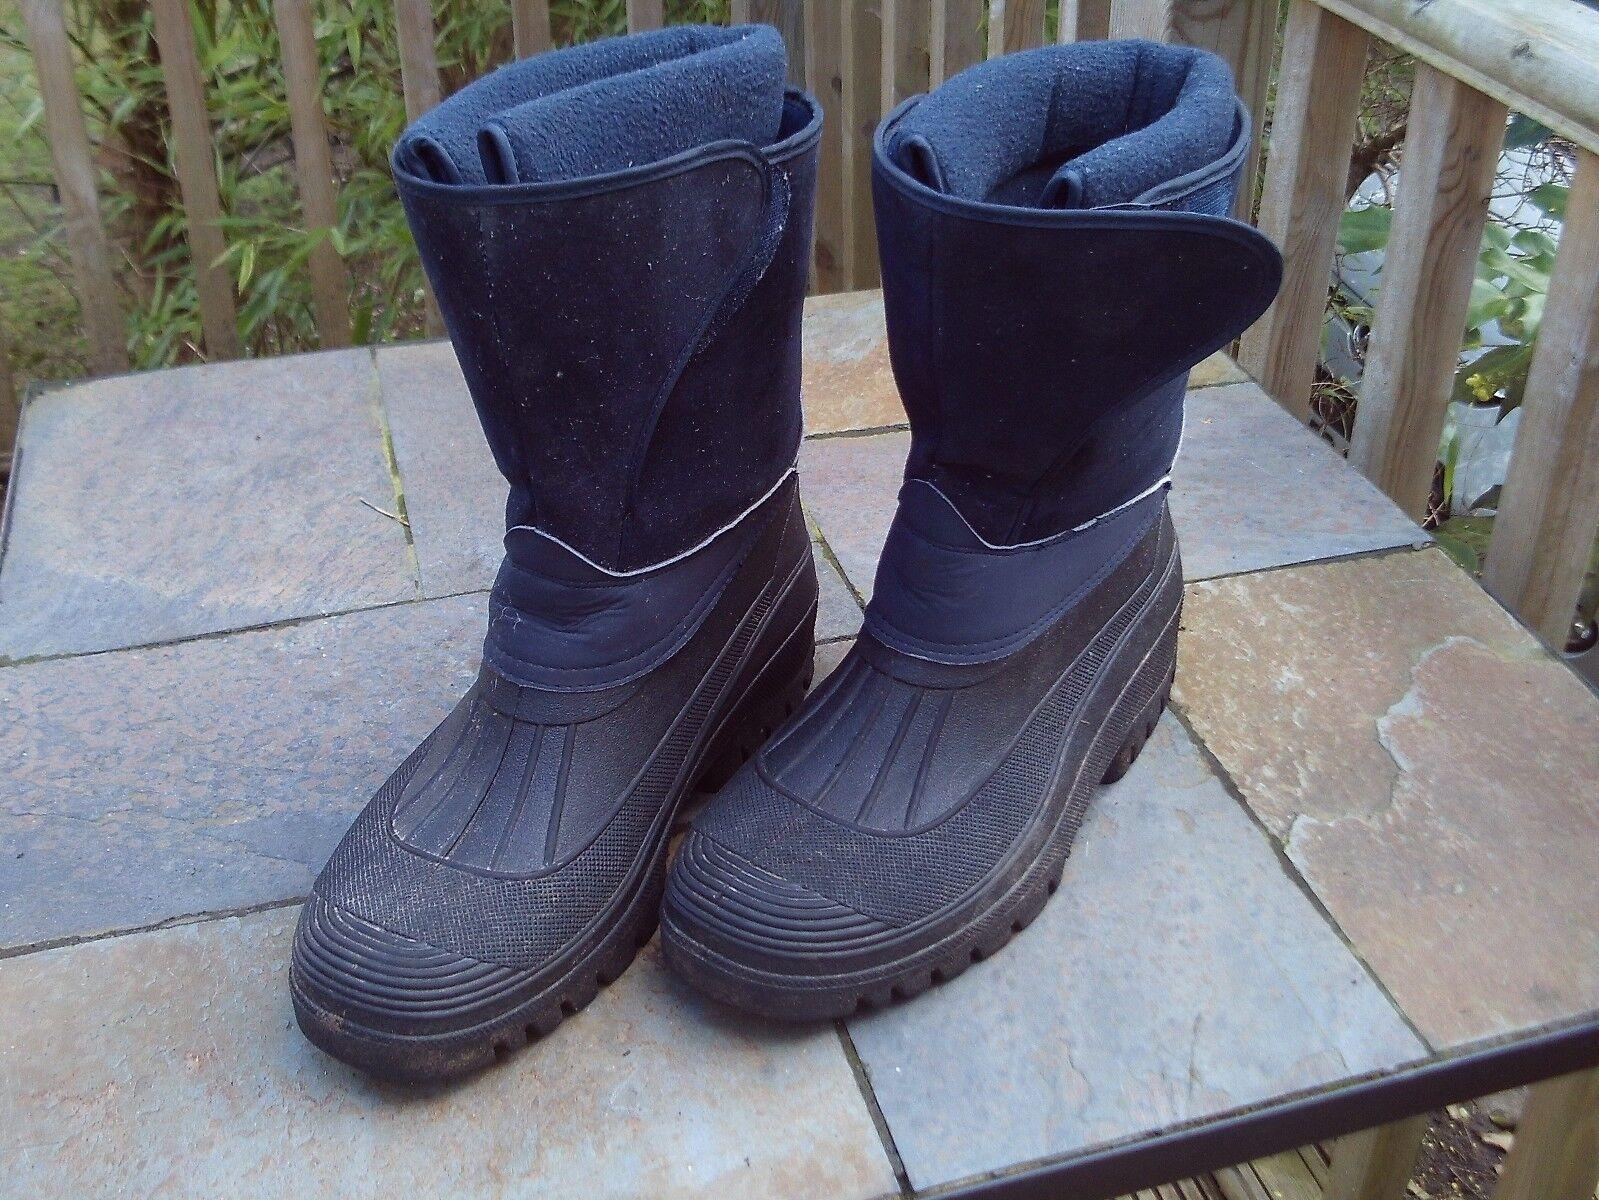 Mens dark bluee waterproof boots with fleecy lining - size 9